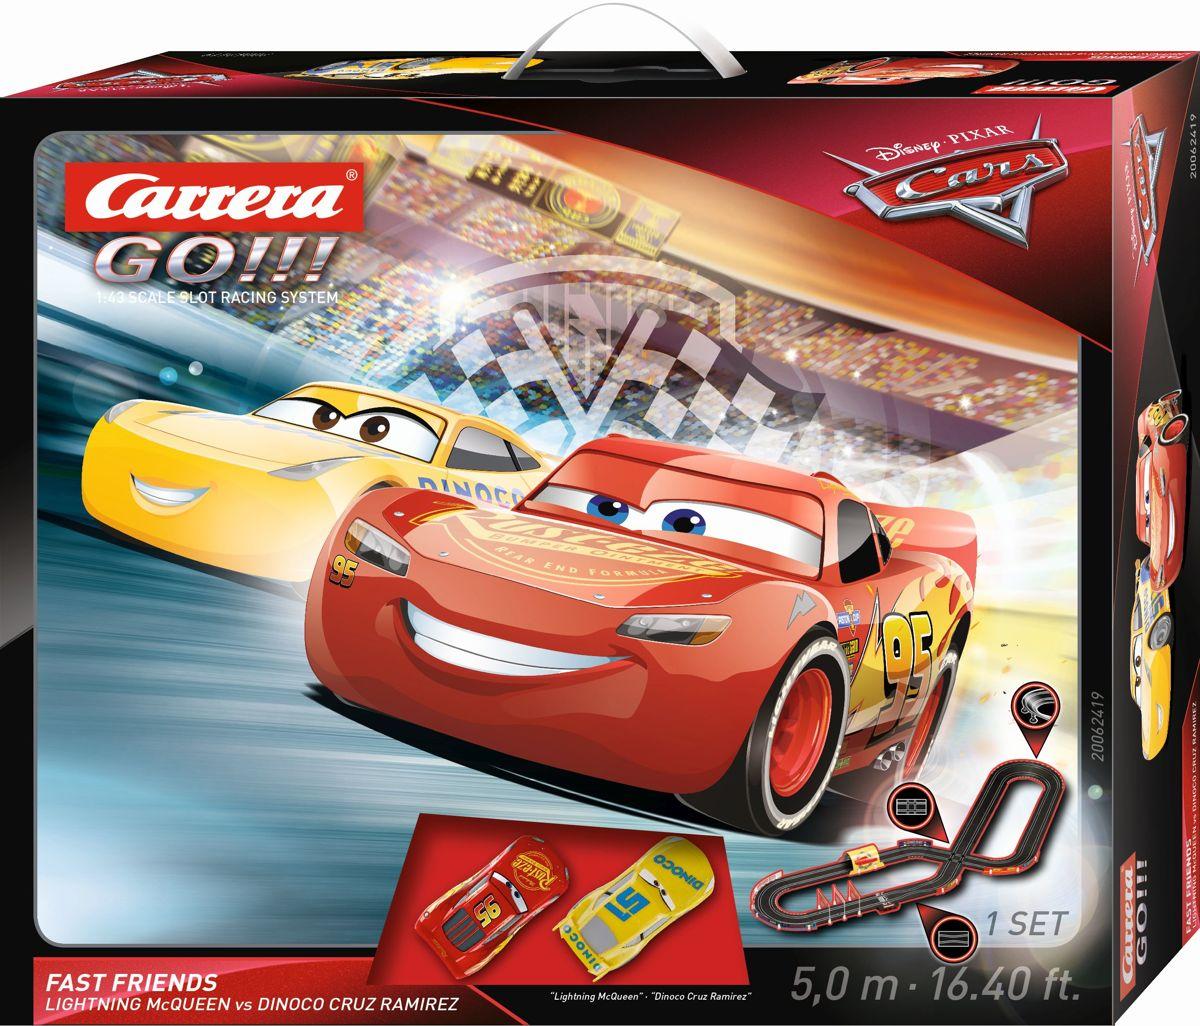 Carrera Go racebaan Disney Pixar Cars 3 - Fast Not Last